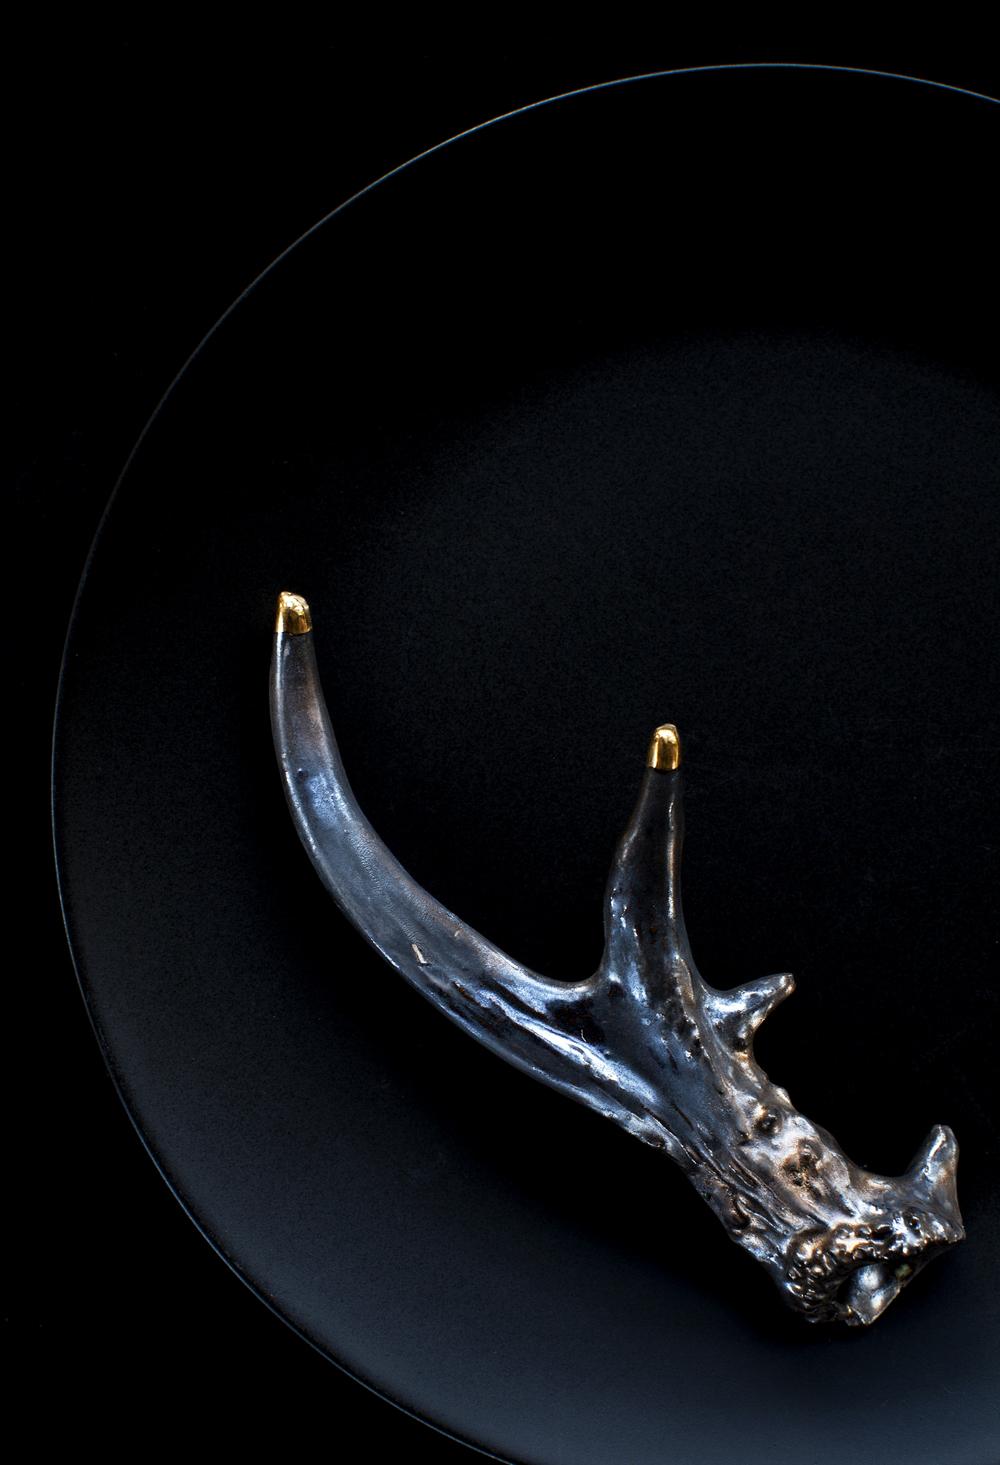 0577-HoneycombStudio-Antlers-89_Final.jpg